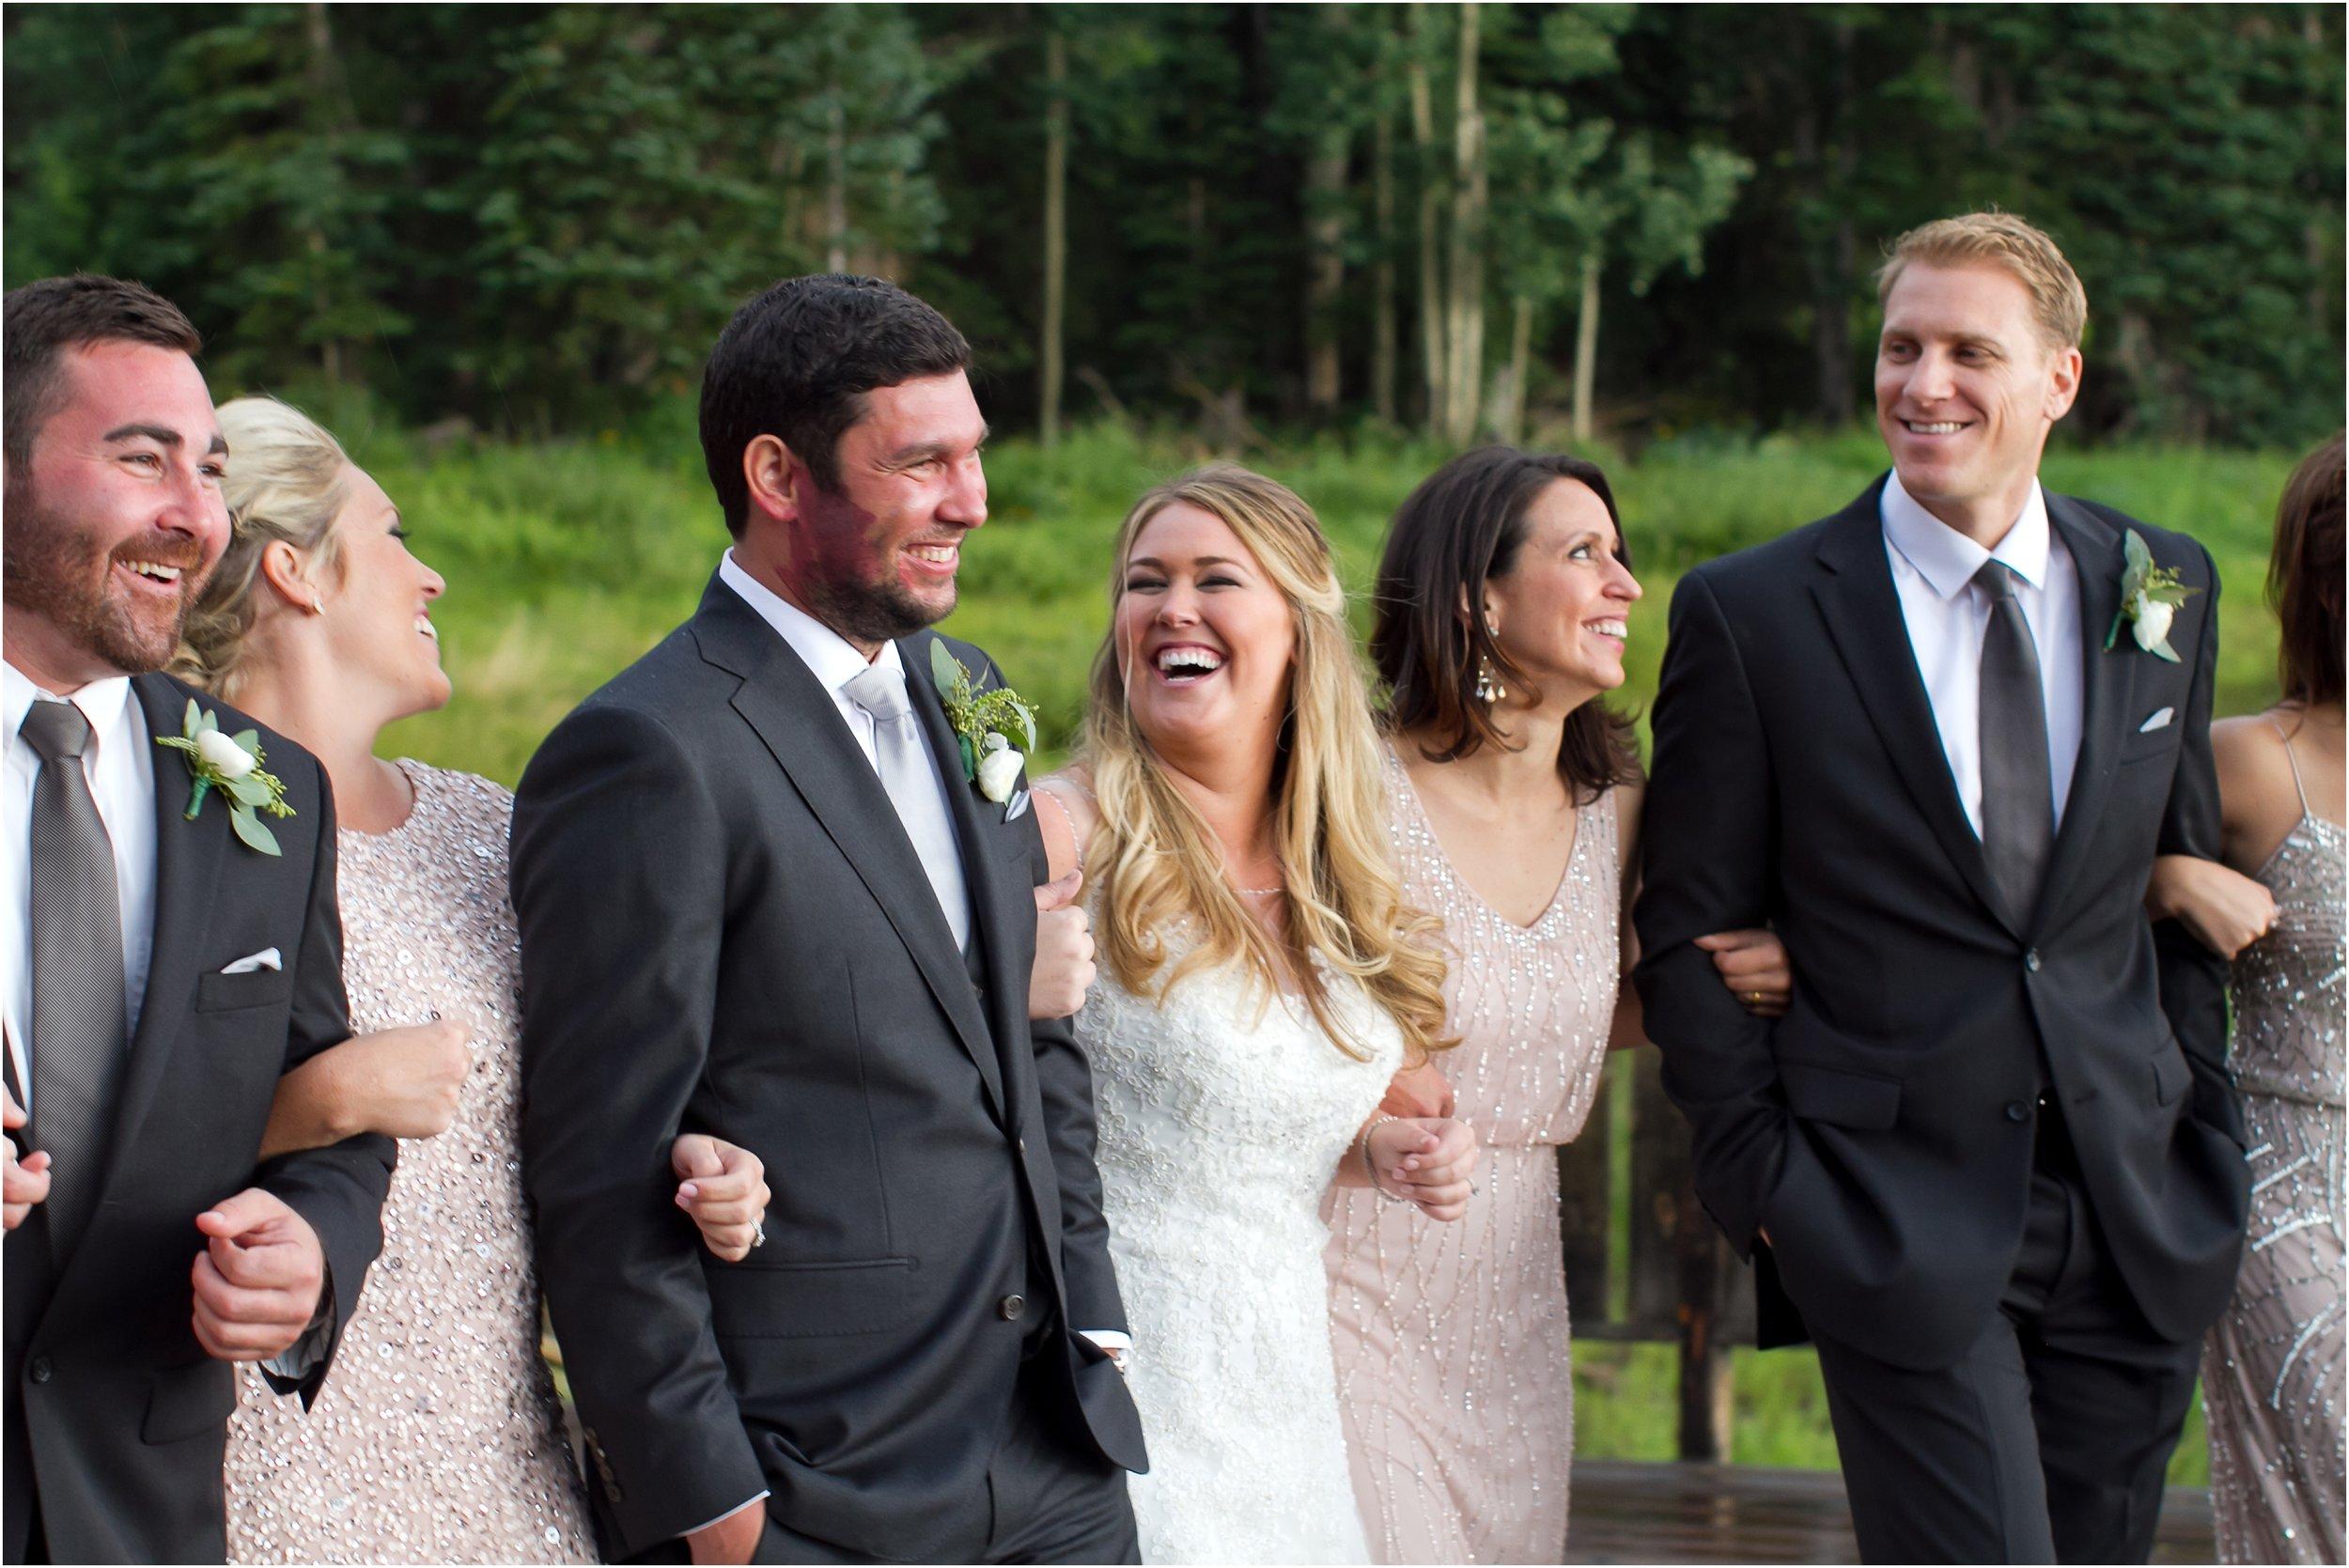 wedding-photographers-in-durango-colorado.jpg